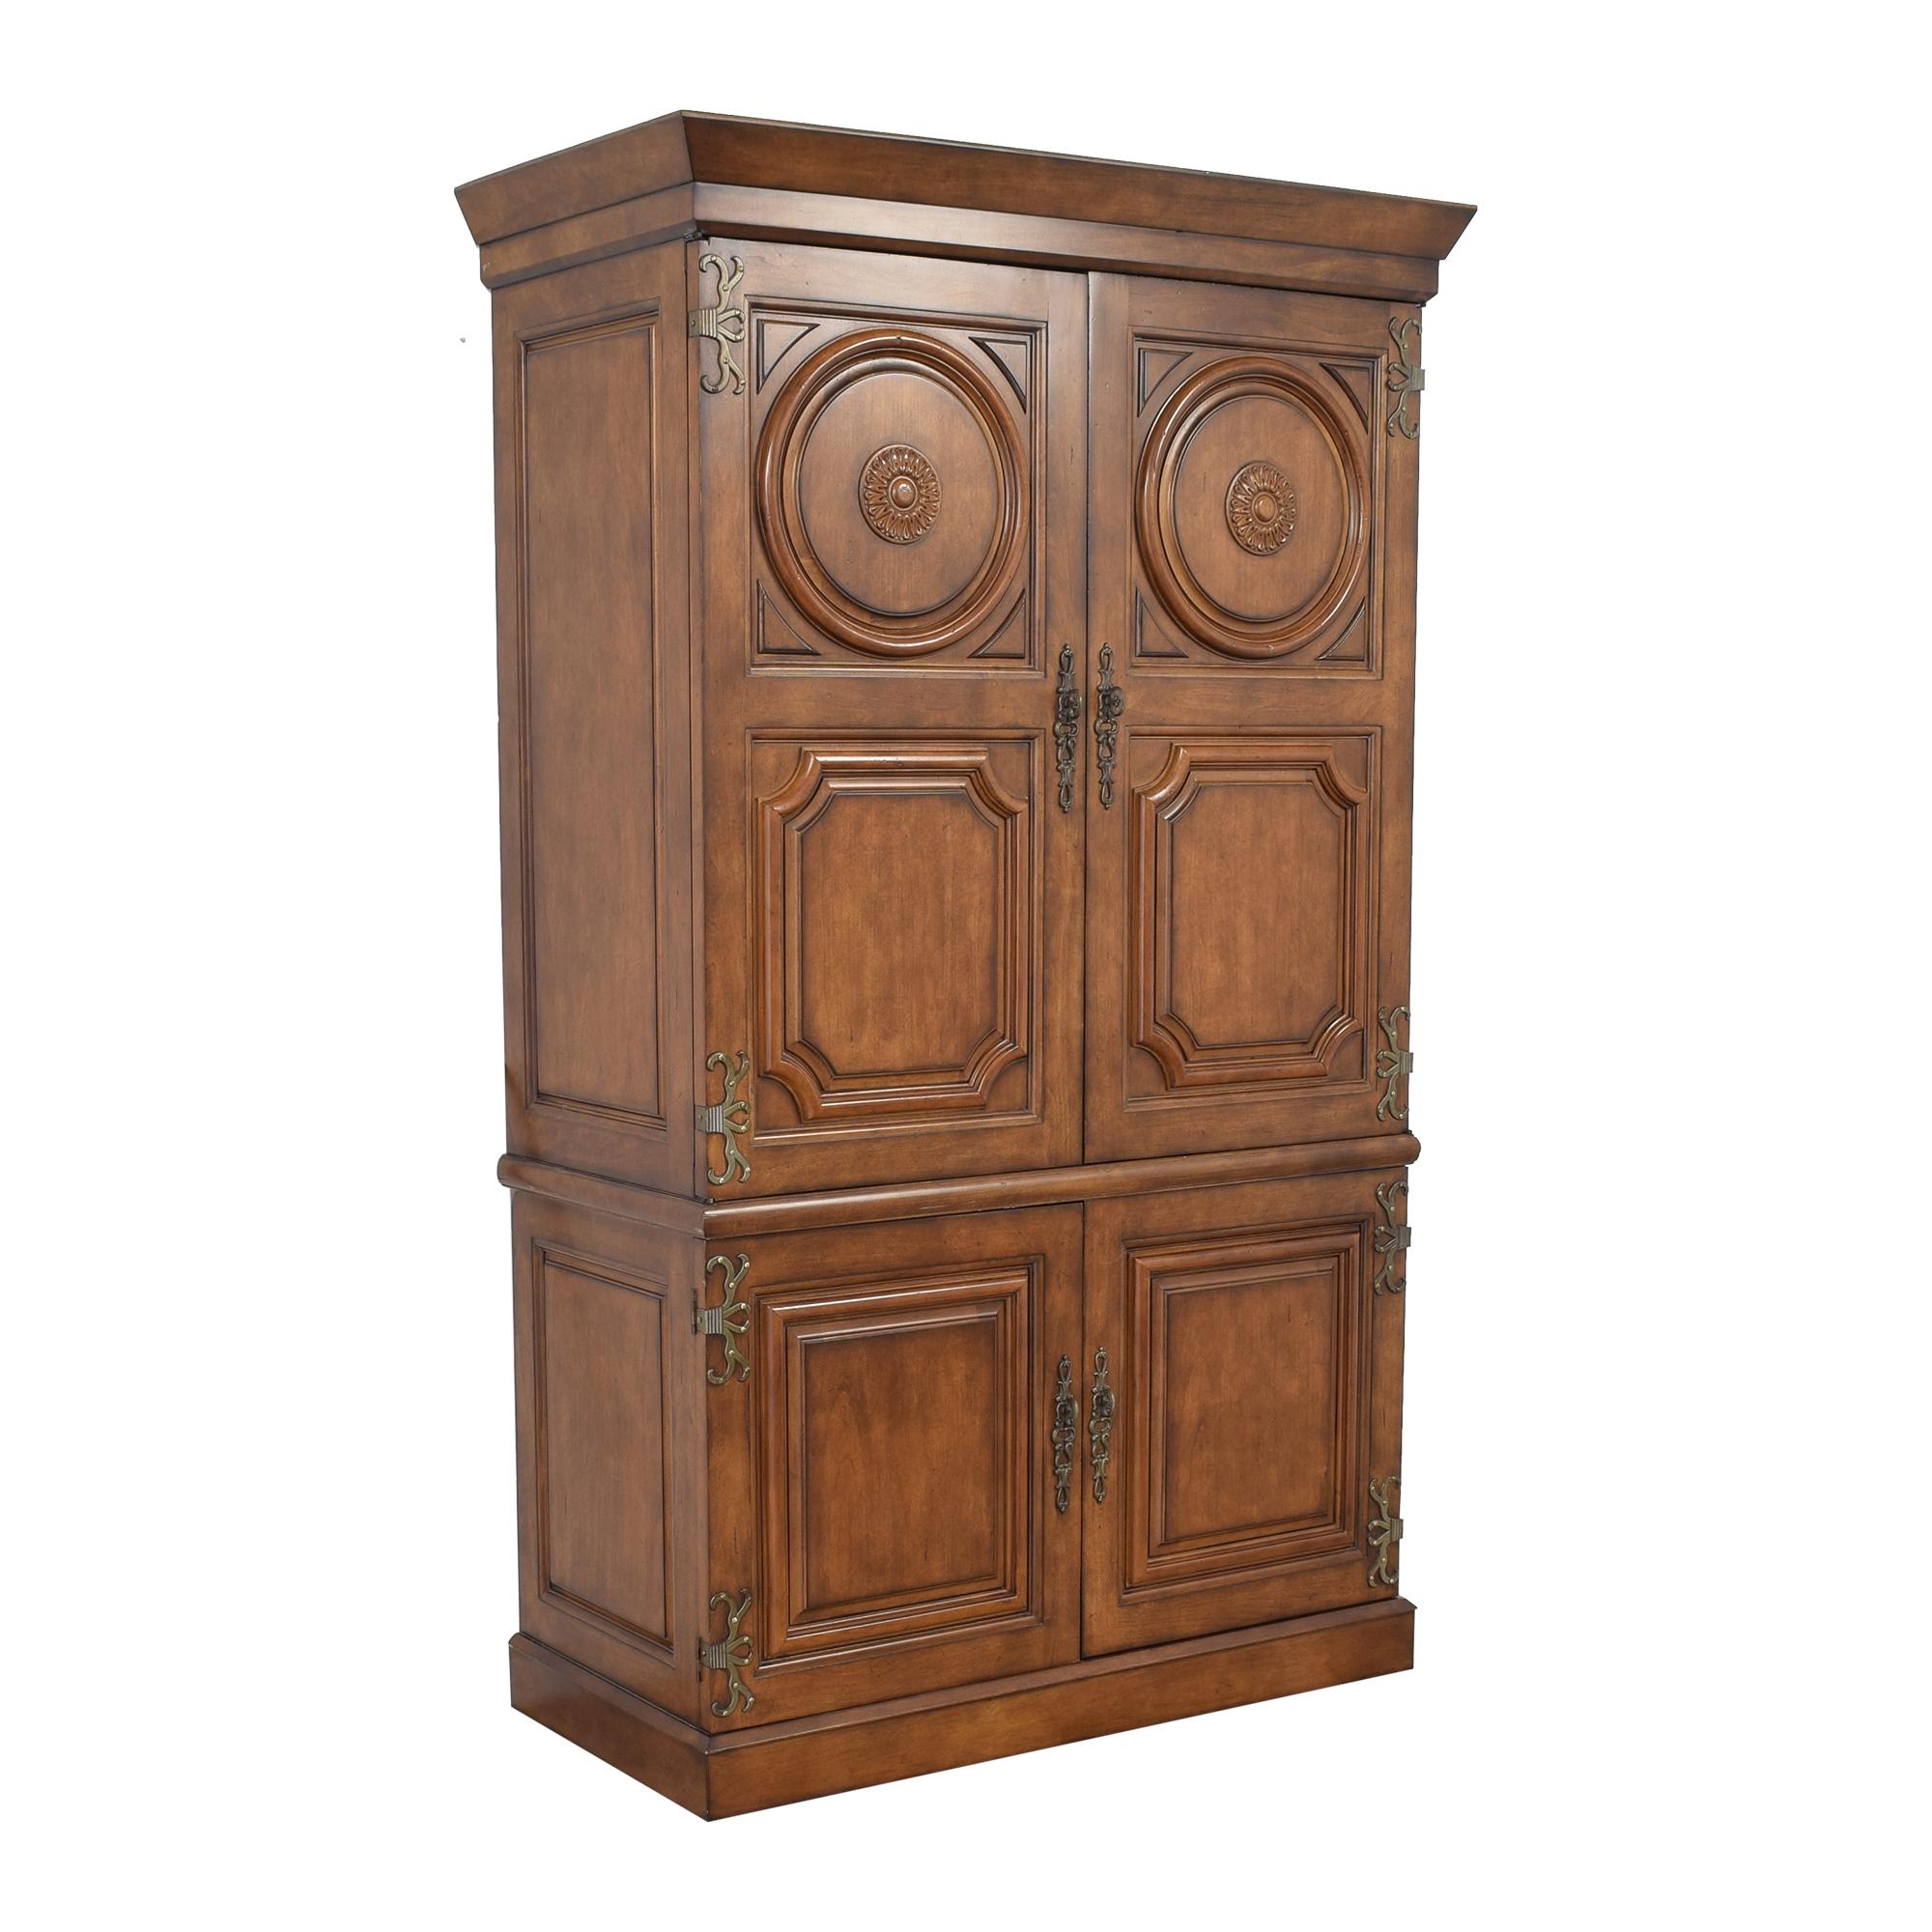 shop Century Furniture Century Furniture Tuscany Armoire online